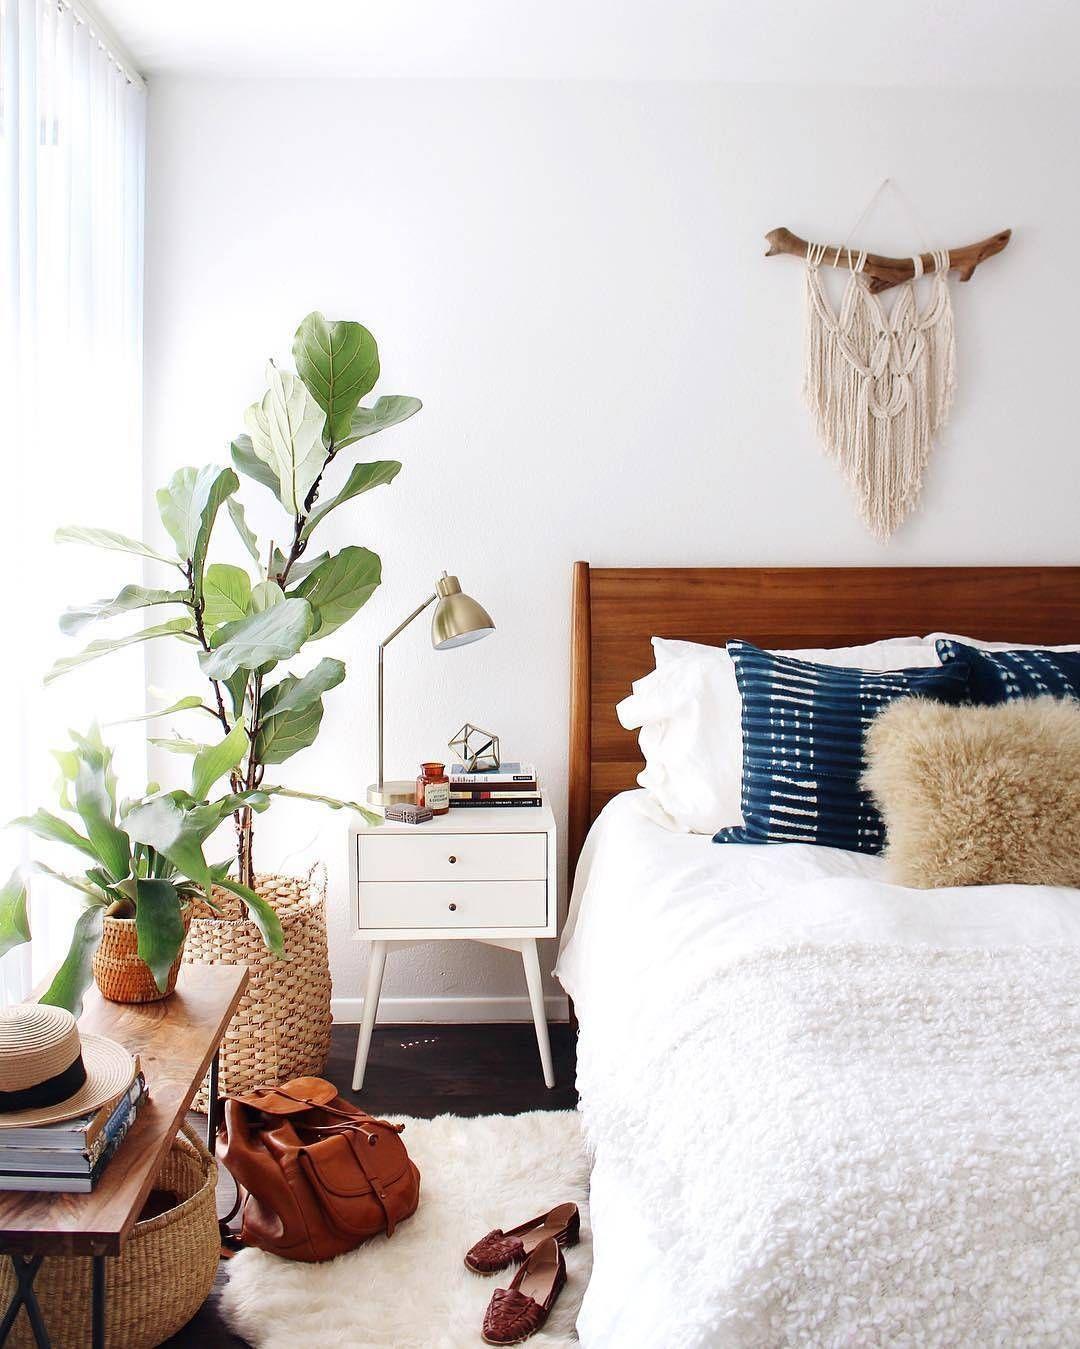 Modern Bedroom: Mid-century Modern Interior Style